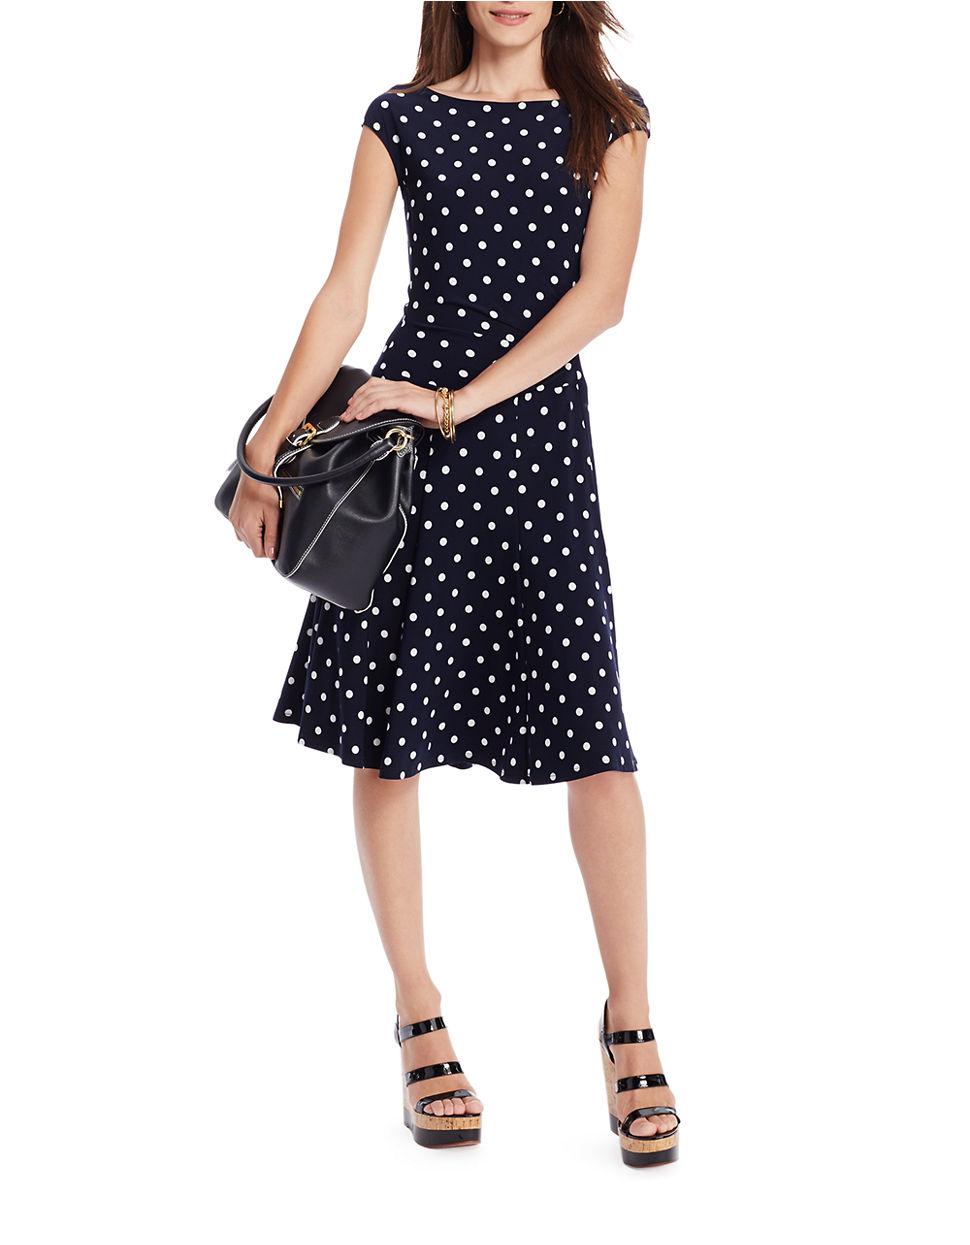 Lauren by ralph lauren Polka-Dot Jersey Dress in Blue ...